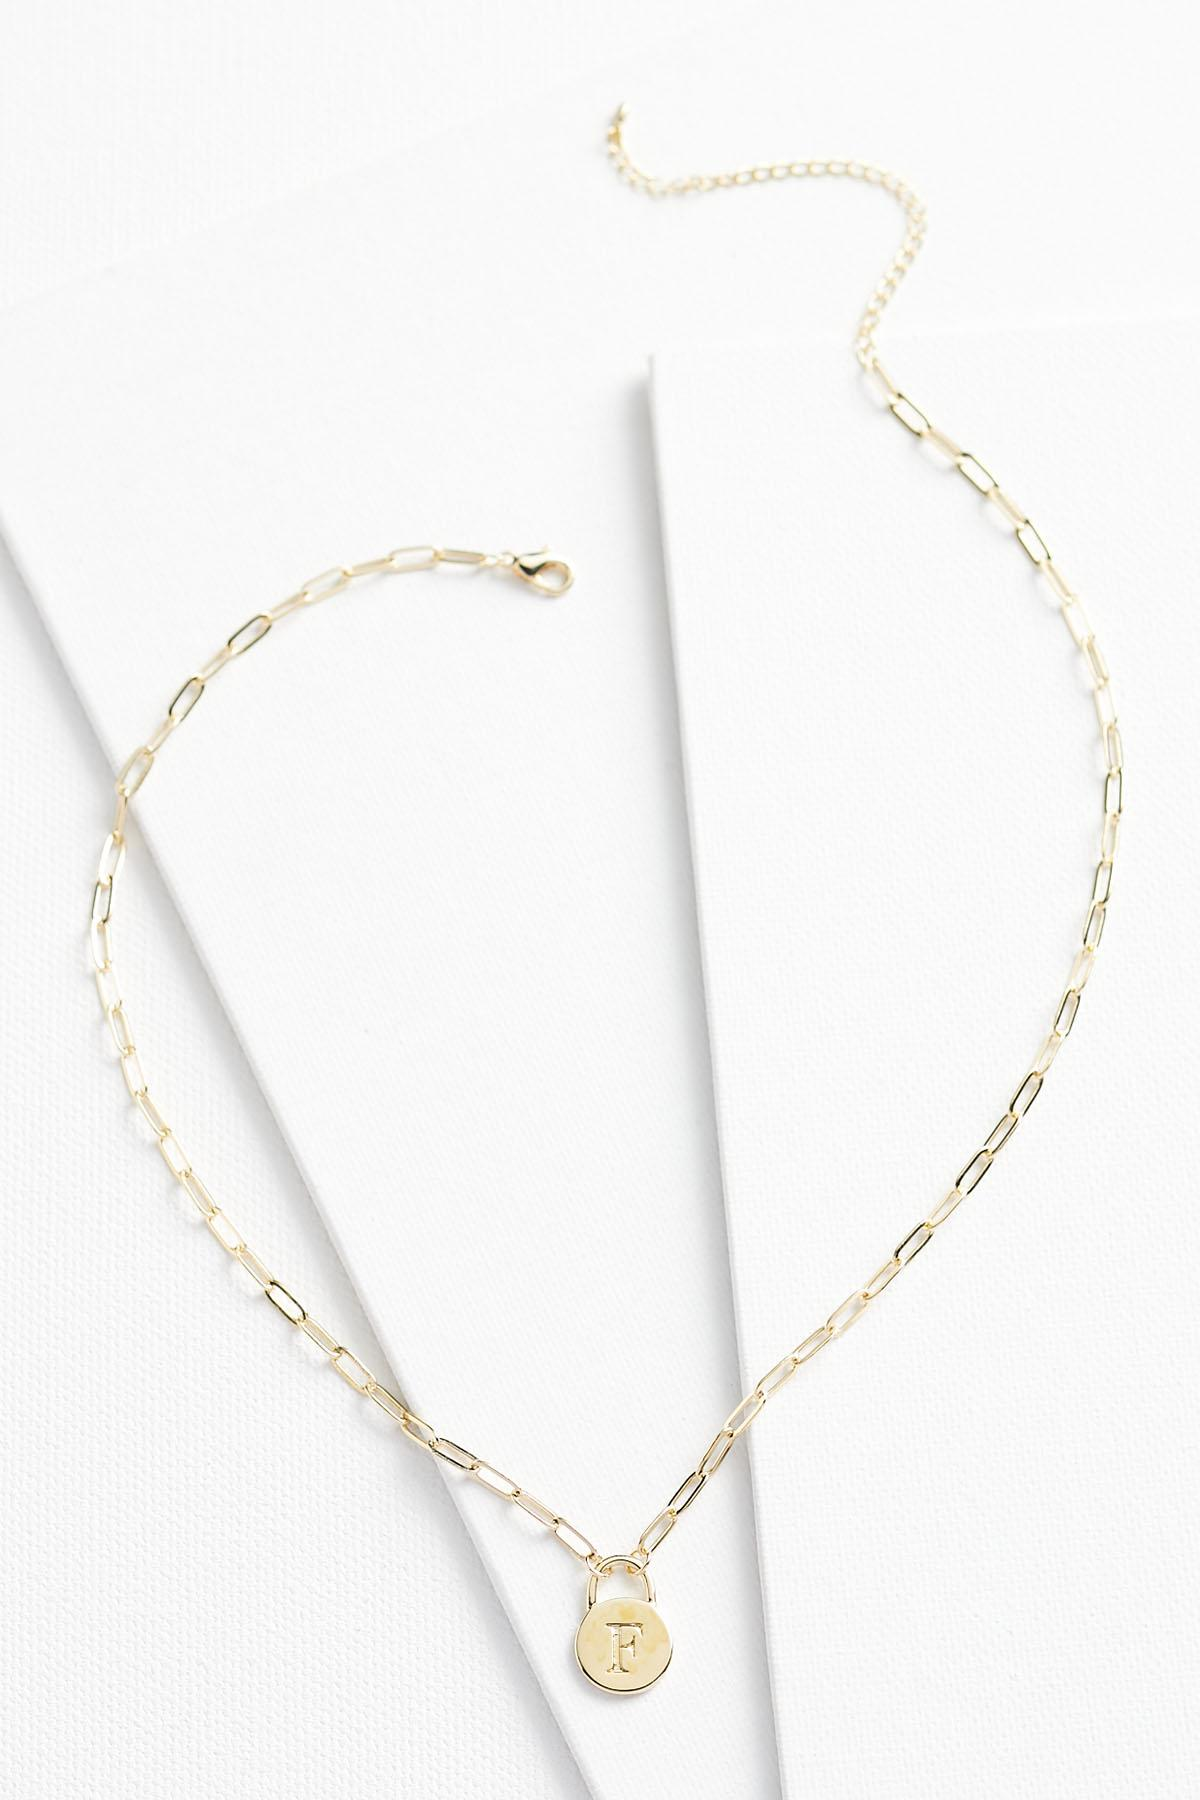 18k F Pendant Necklace